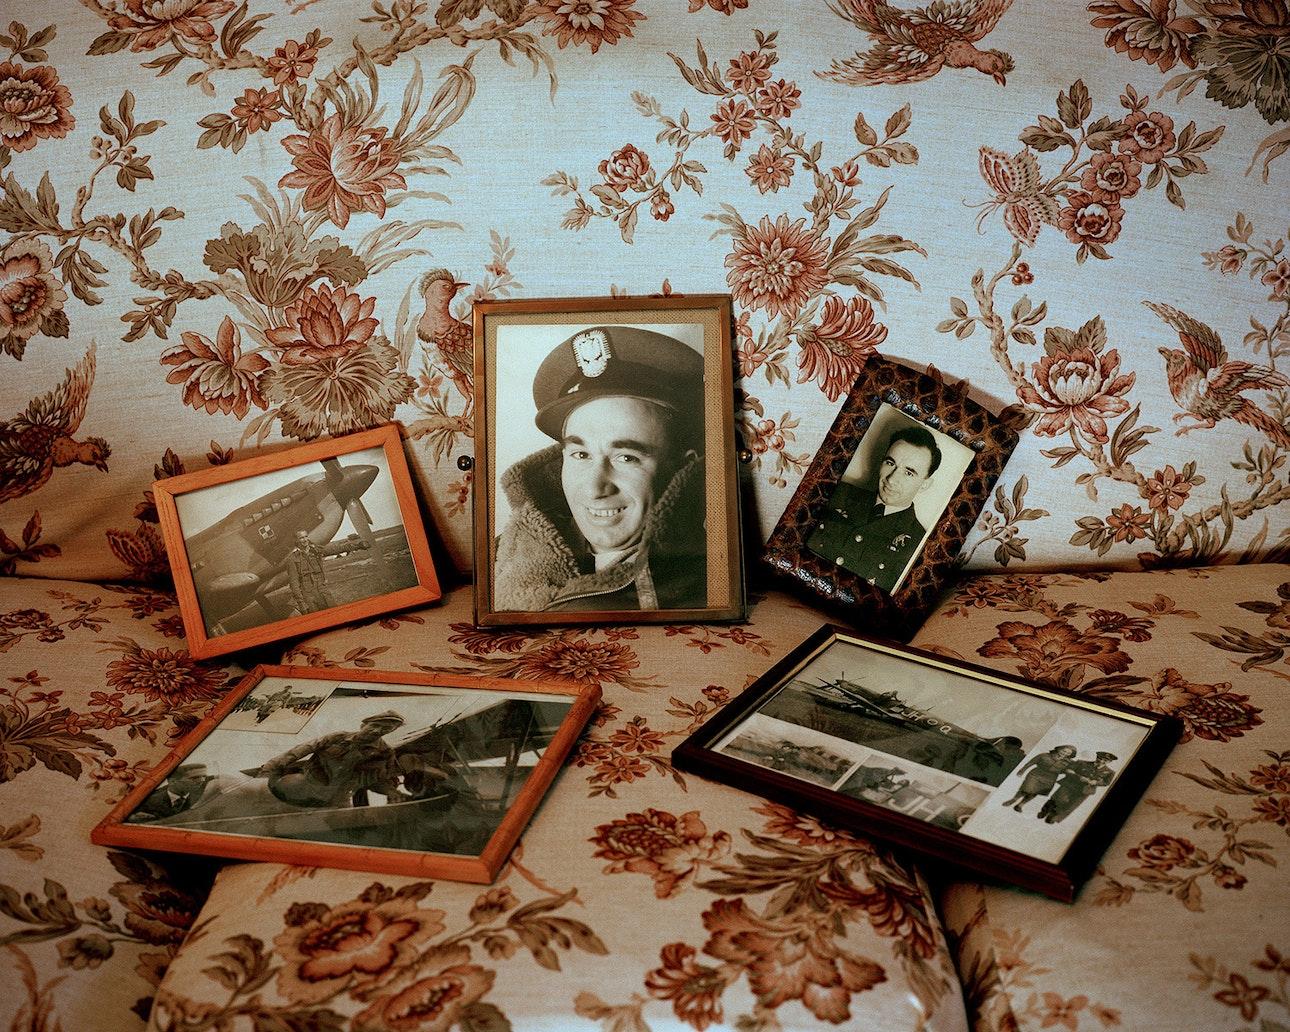 Adam-Ostrowski-Archival-Pictures